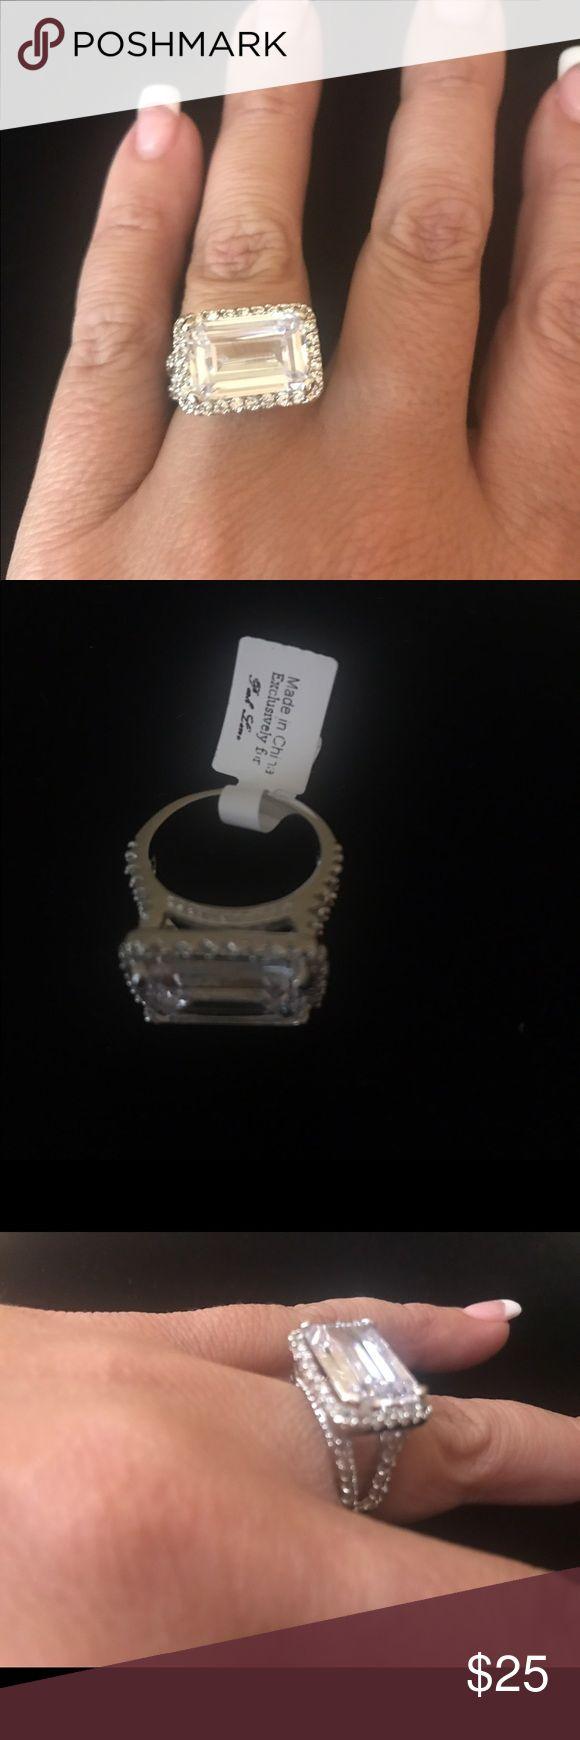 Park Lane Striking Ring Park Lane Striking Ring CZs size 7. Gorgeous!!!!! Park Lane Jewelry Rings